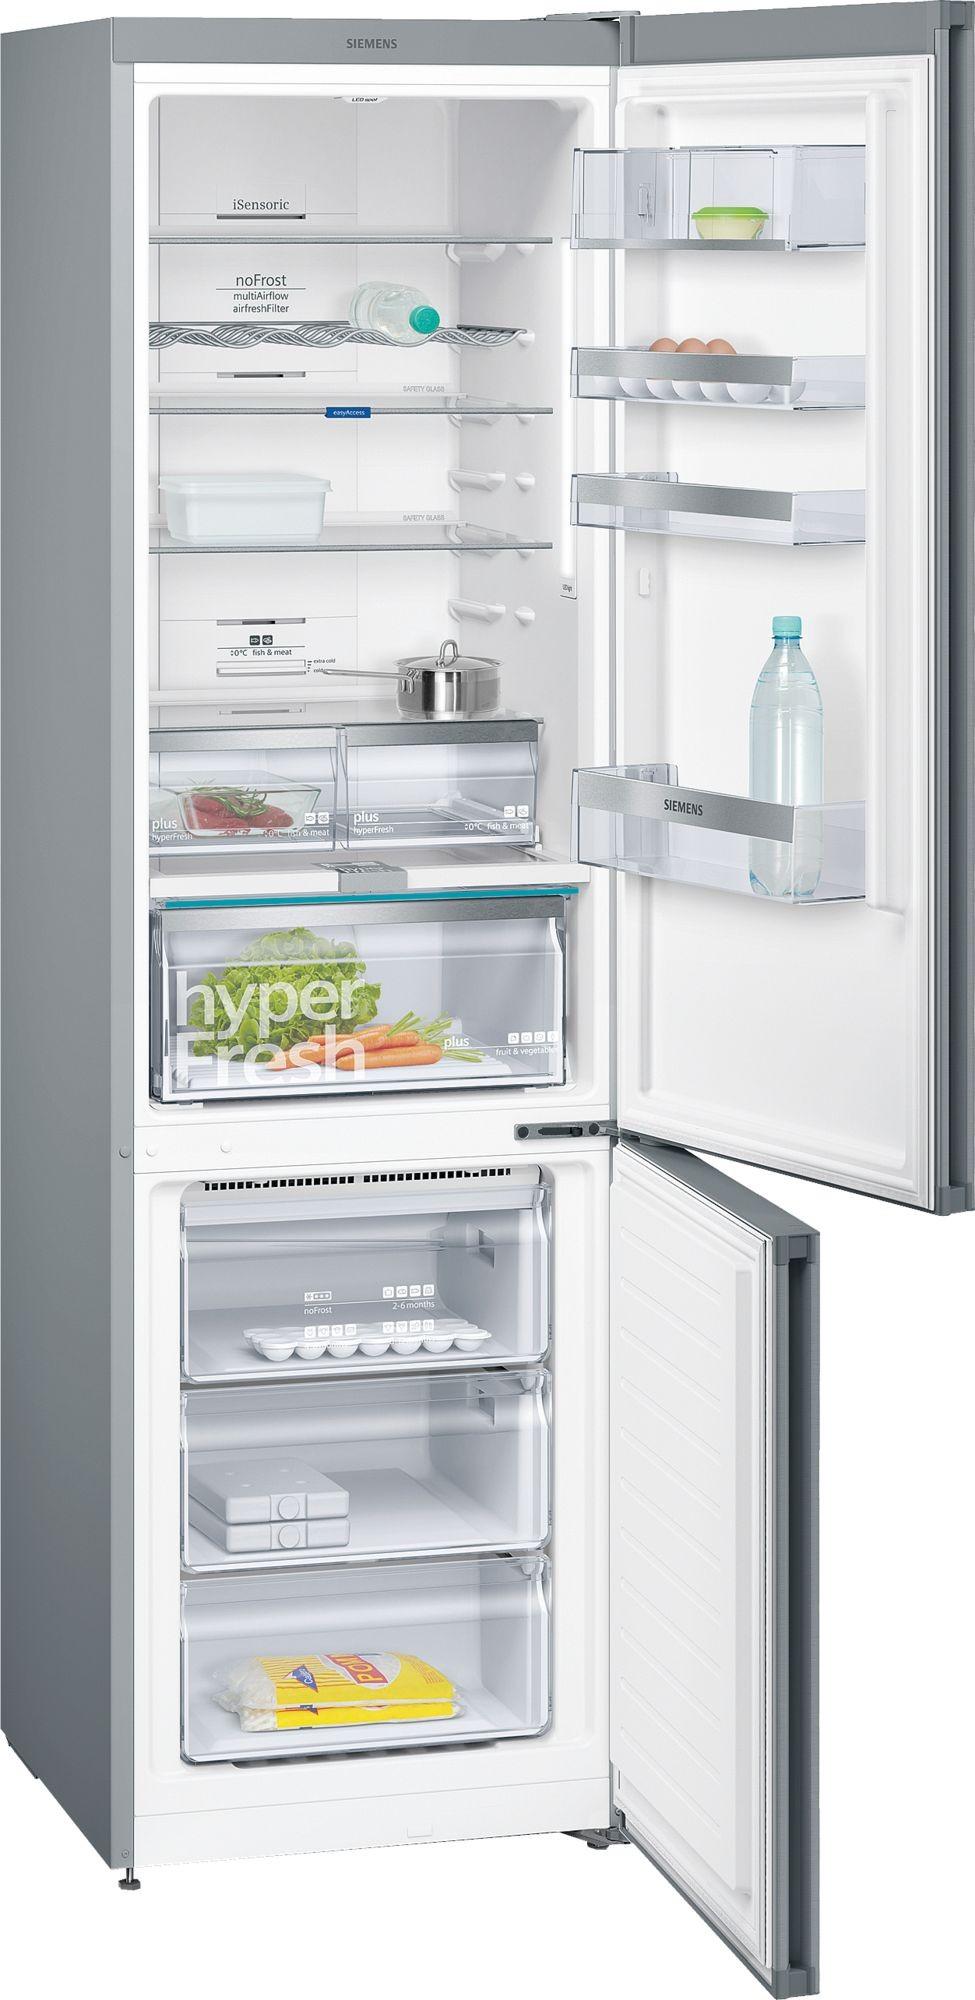 Siemens KG39NLB35 Fridge Freezer